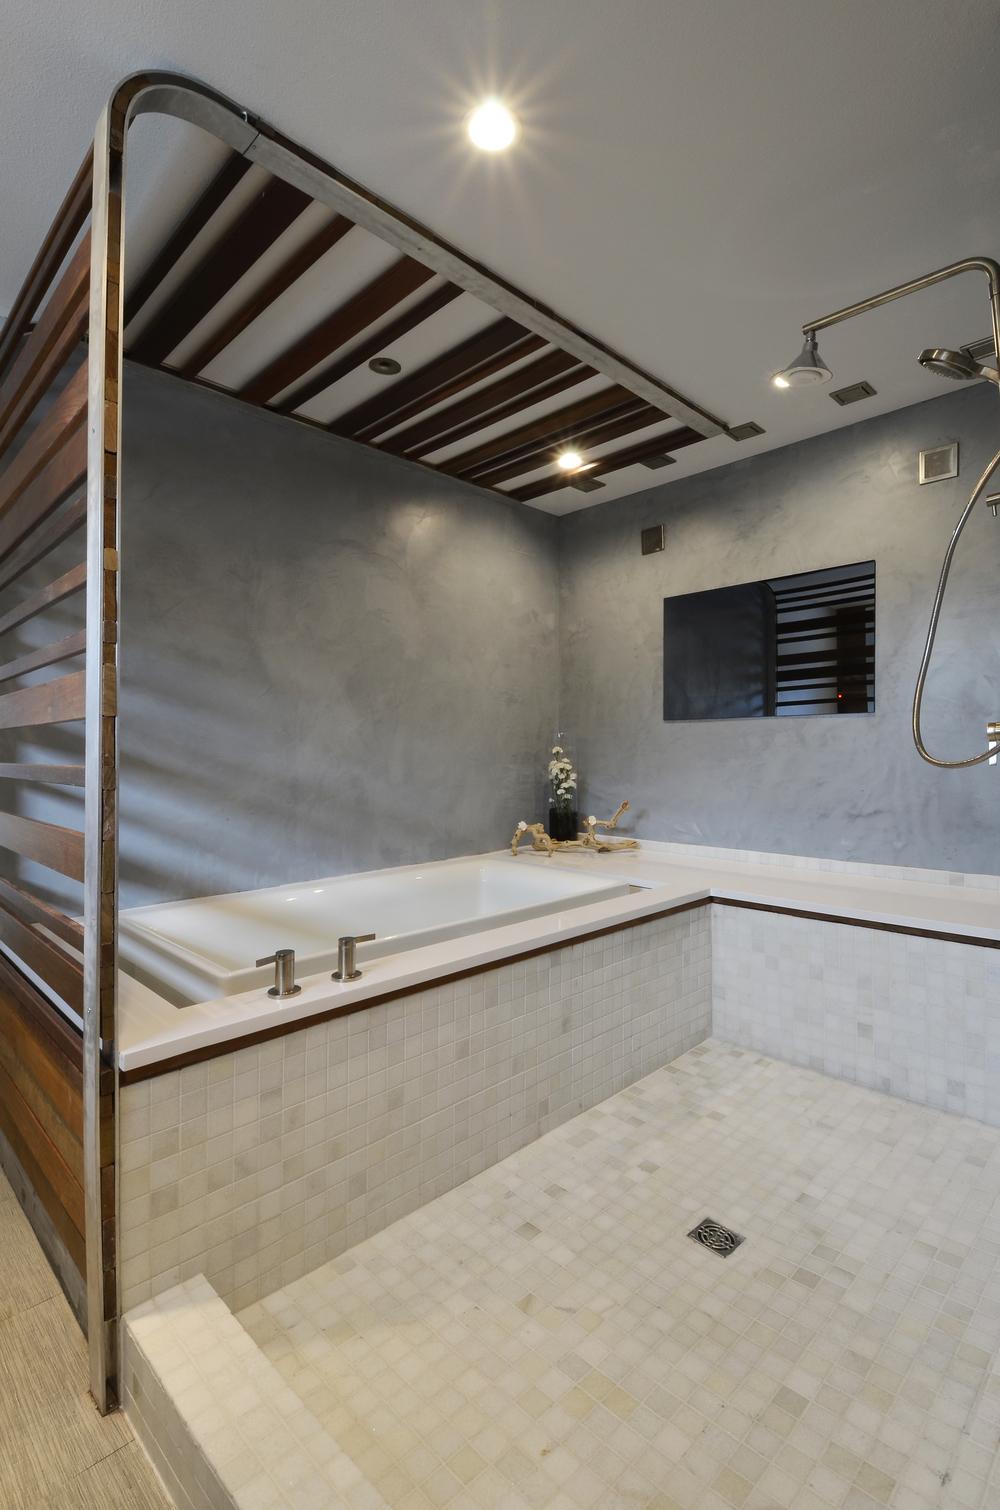 Detail is King Lakeway Master Bathroom | Robin Colton Interior Design Studio Austin Texas Blog | www.robincolton.com